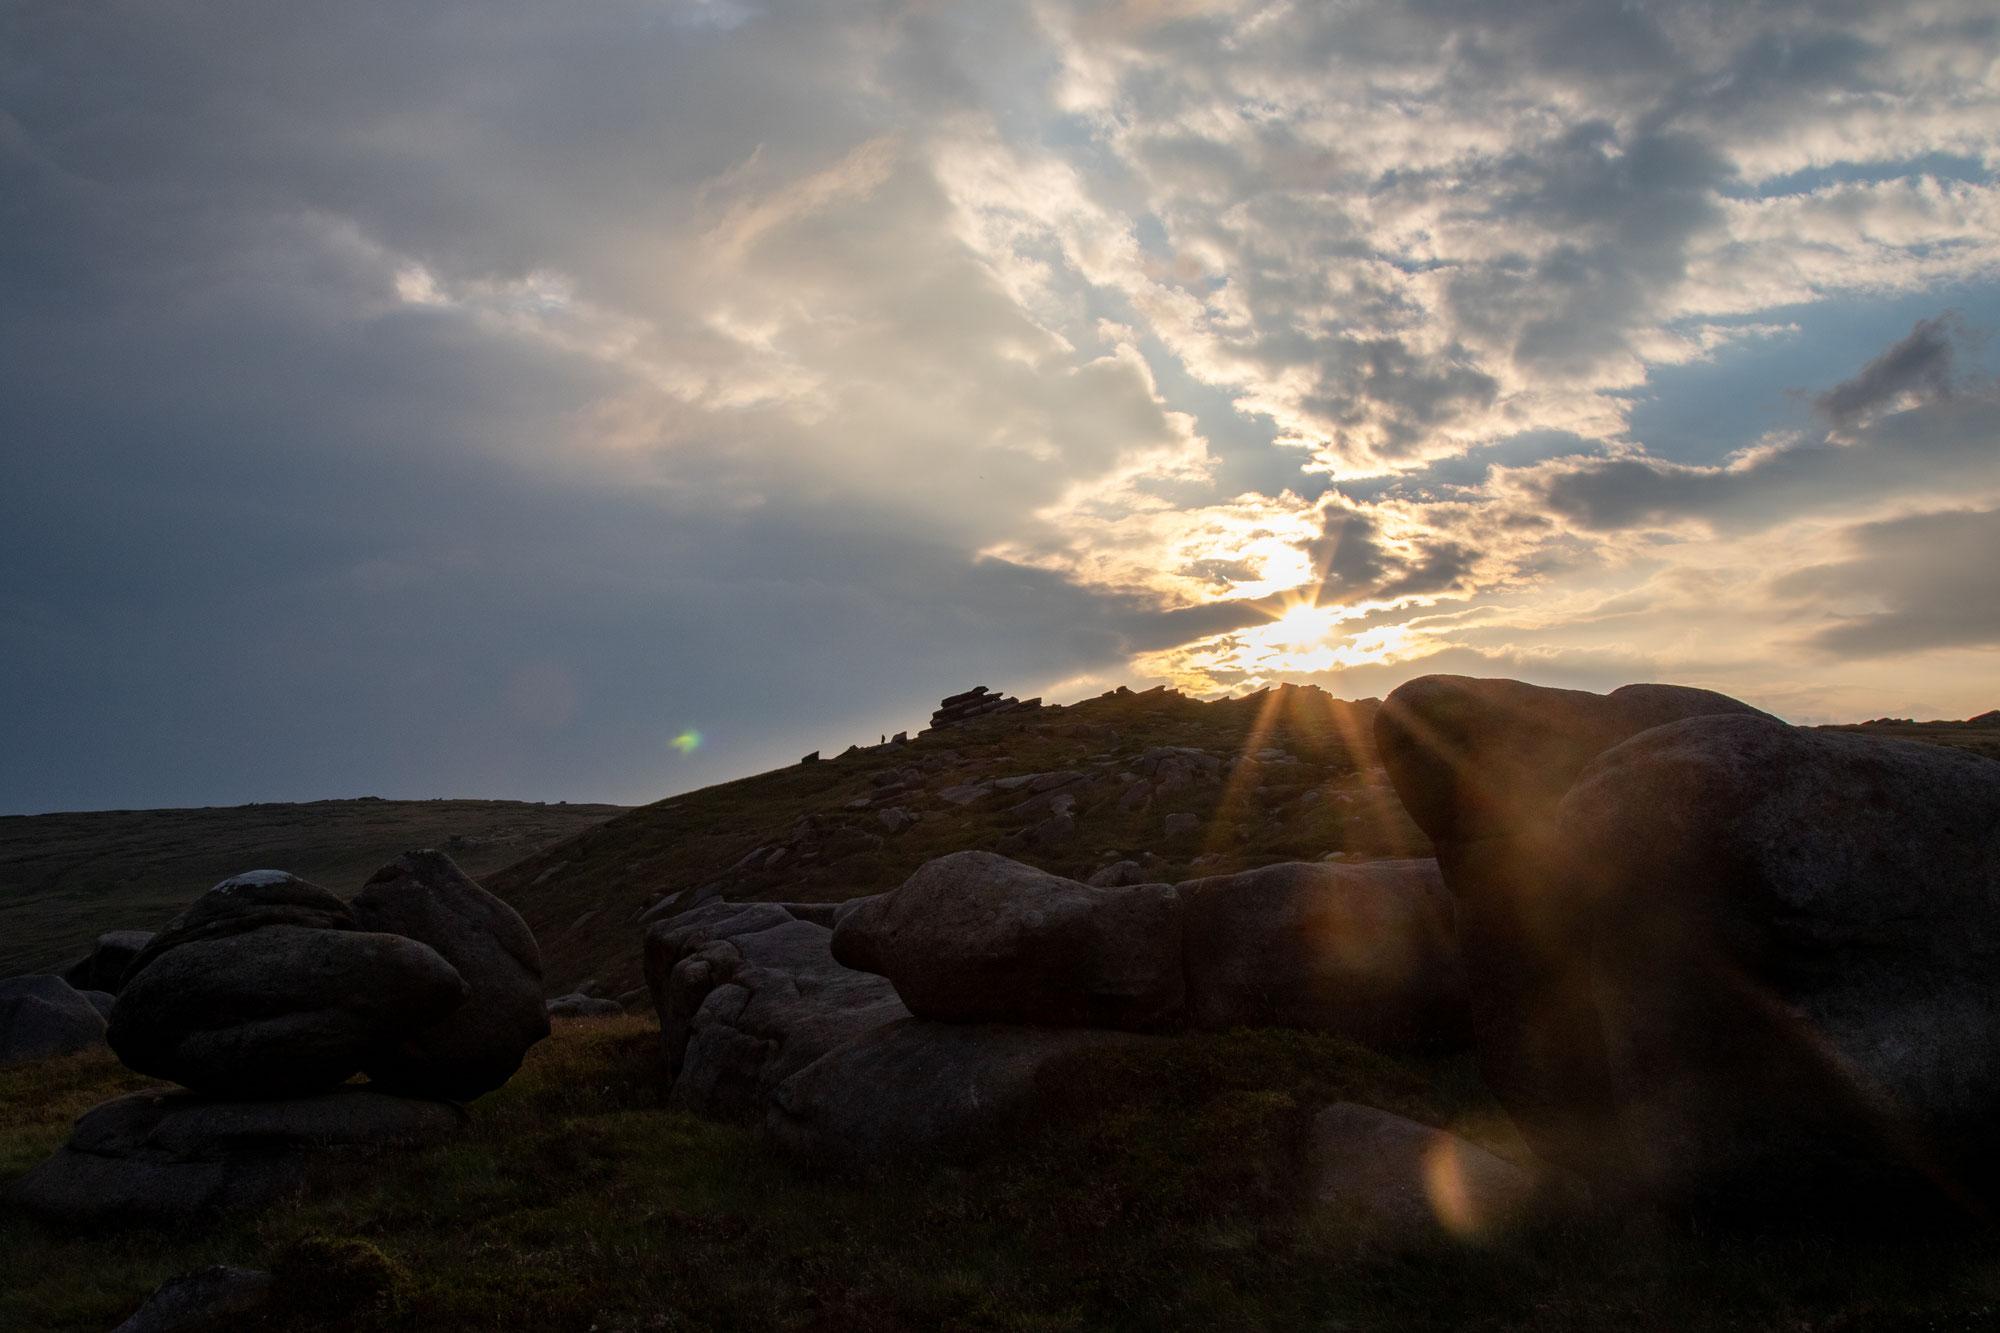 Wild camping at Kinder Scout, Peak District National Park